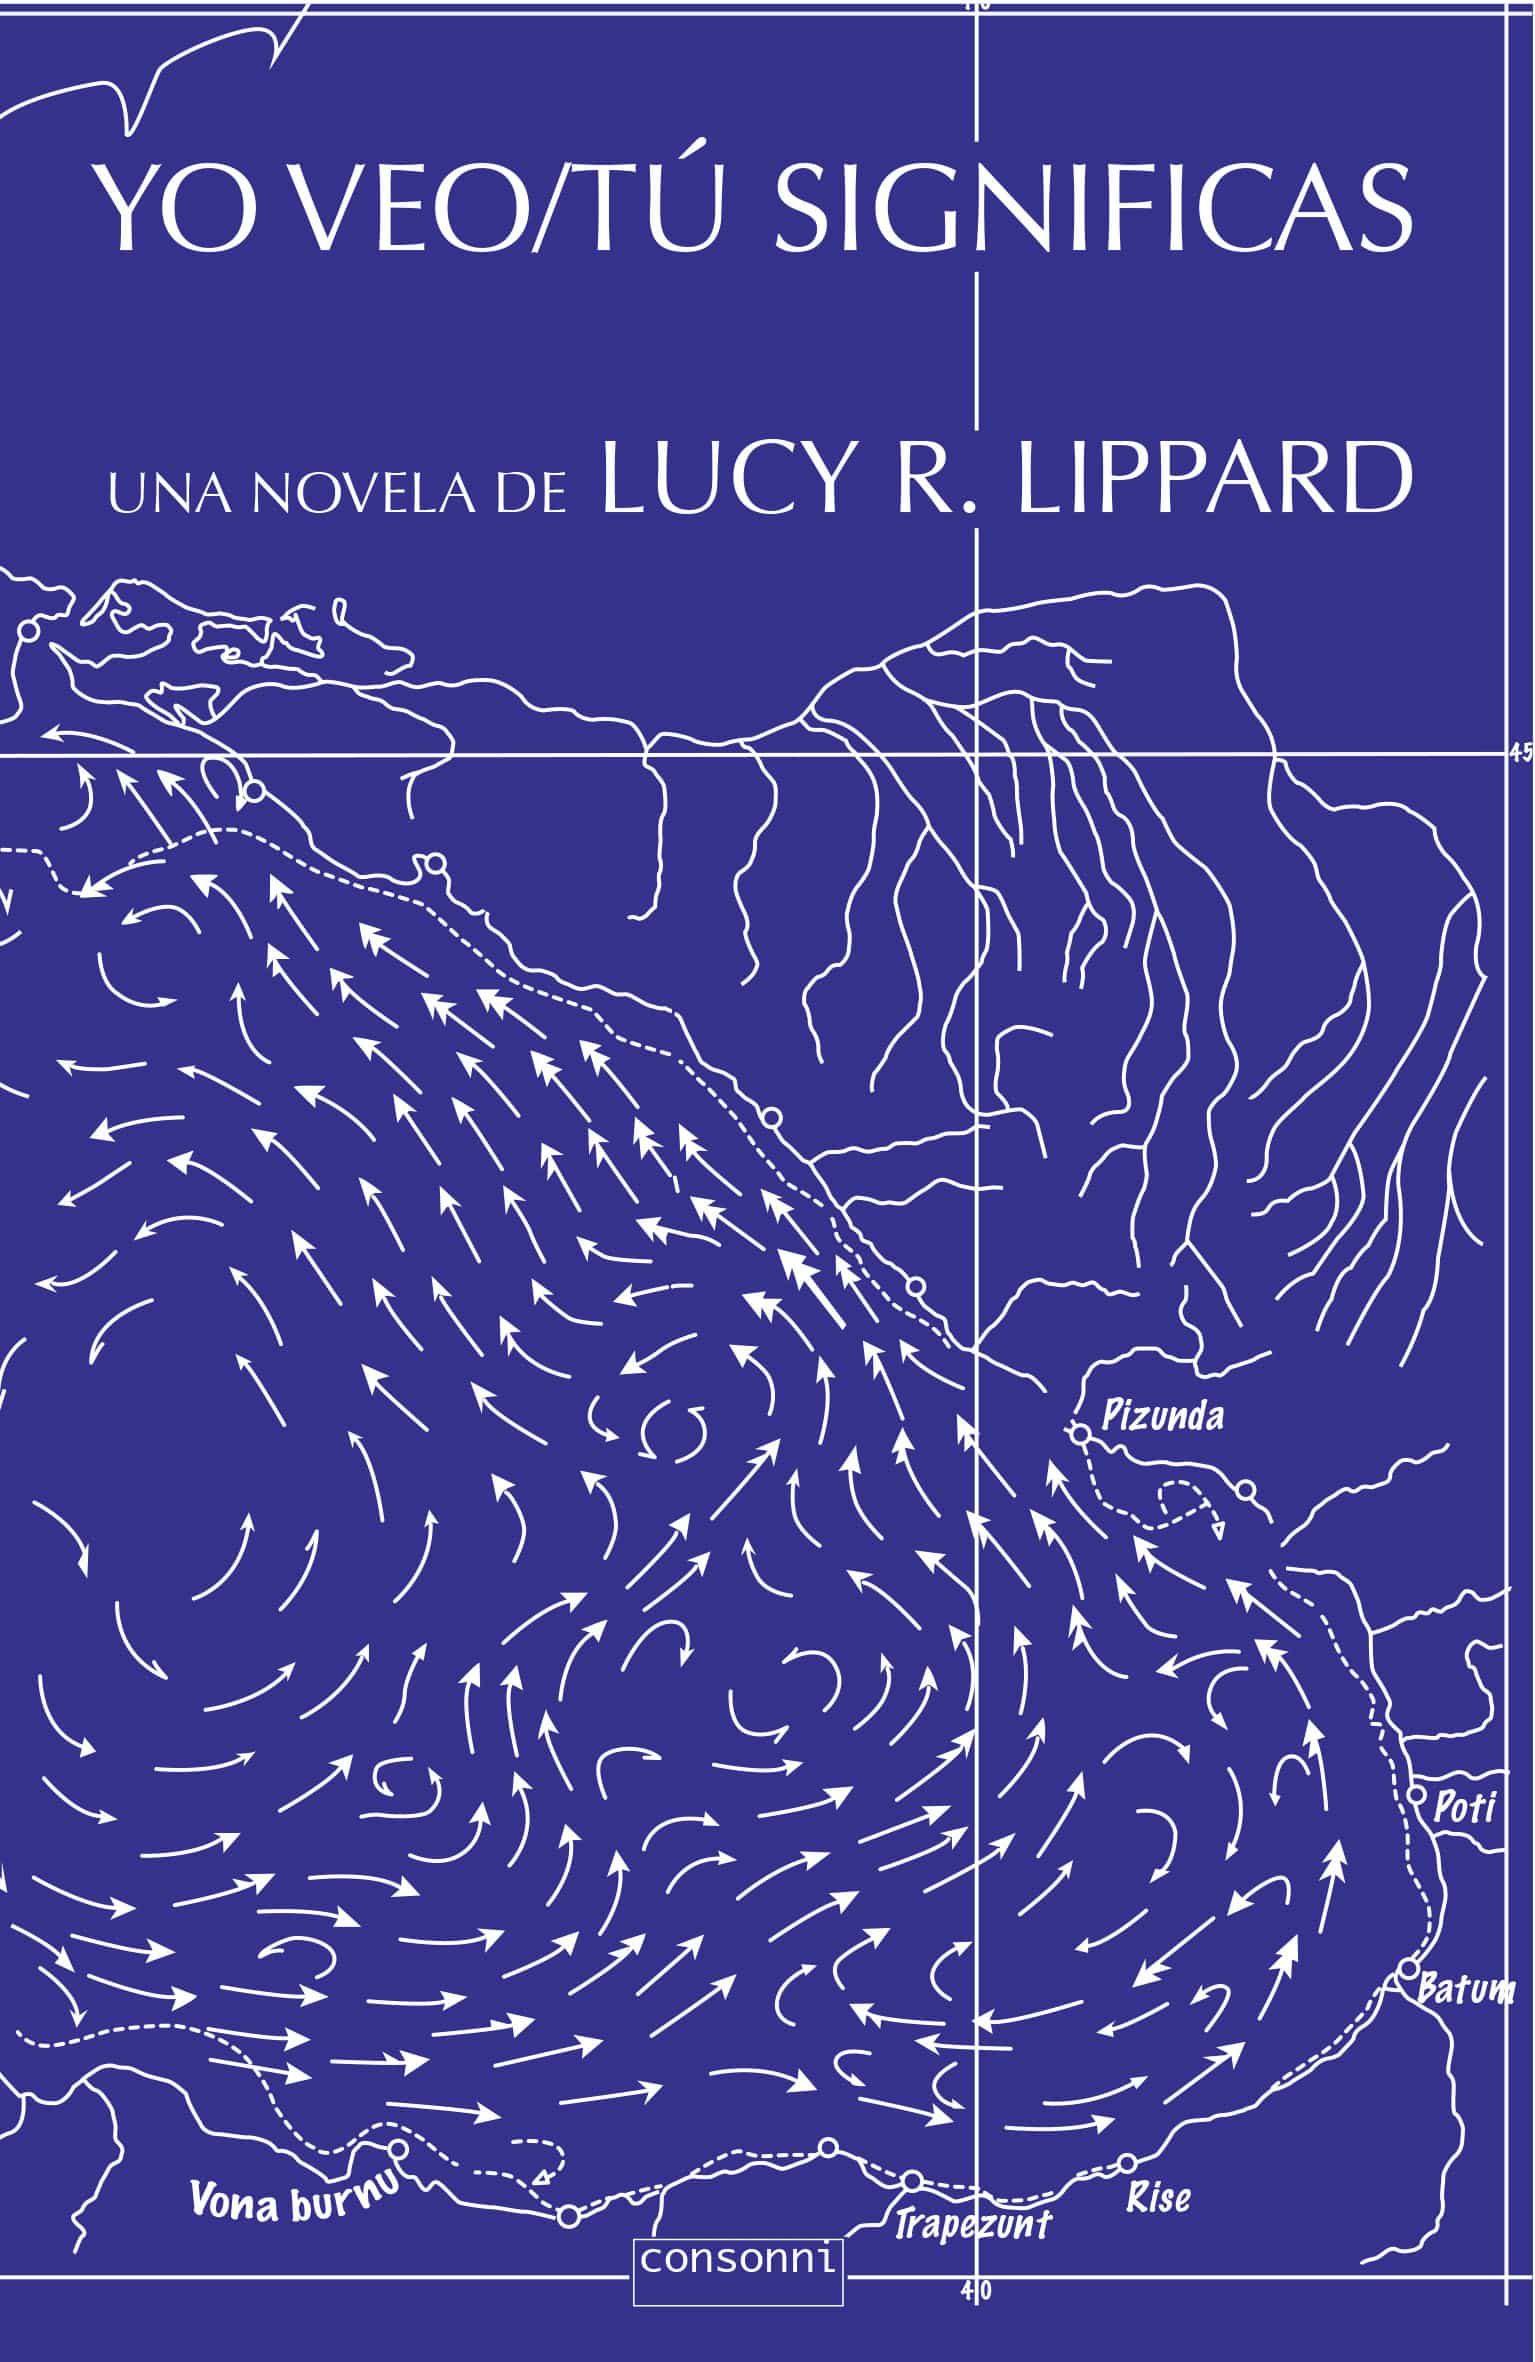 Yo Veo / Tú Significas - Lippard Lucy R.